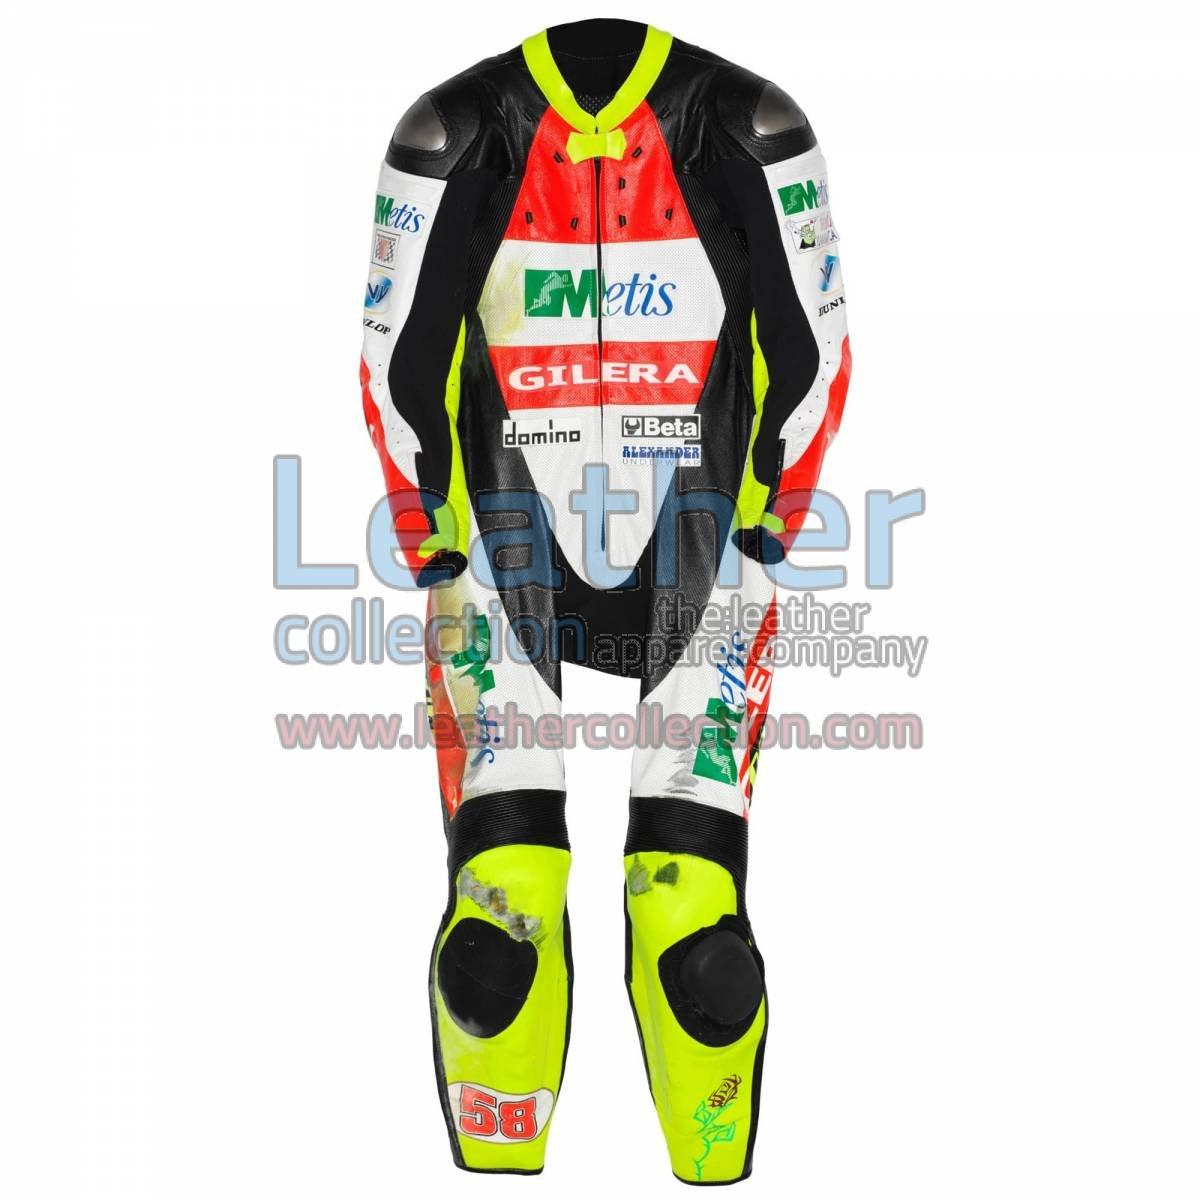 Marco Simoncelli Gilera GP 2007 Leather Suit